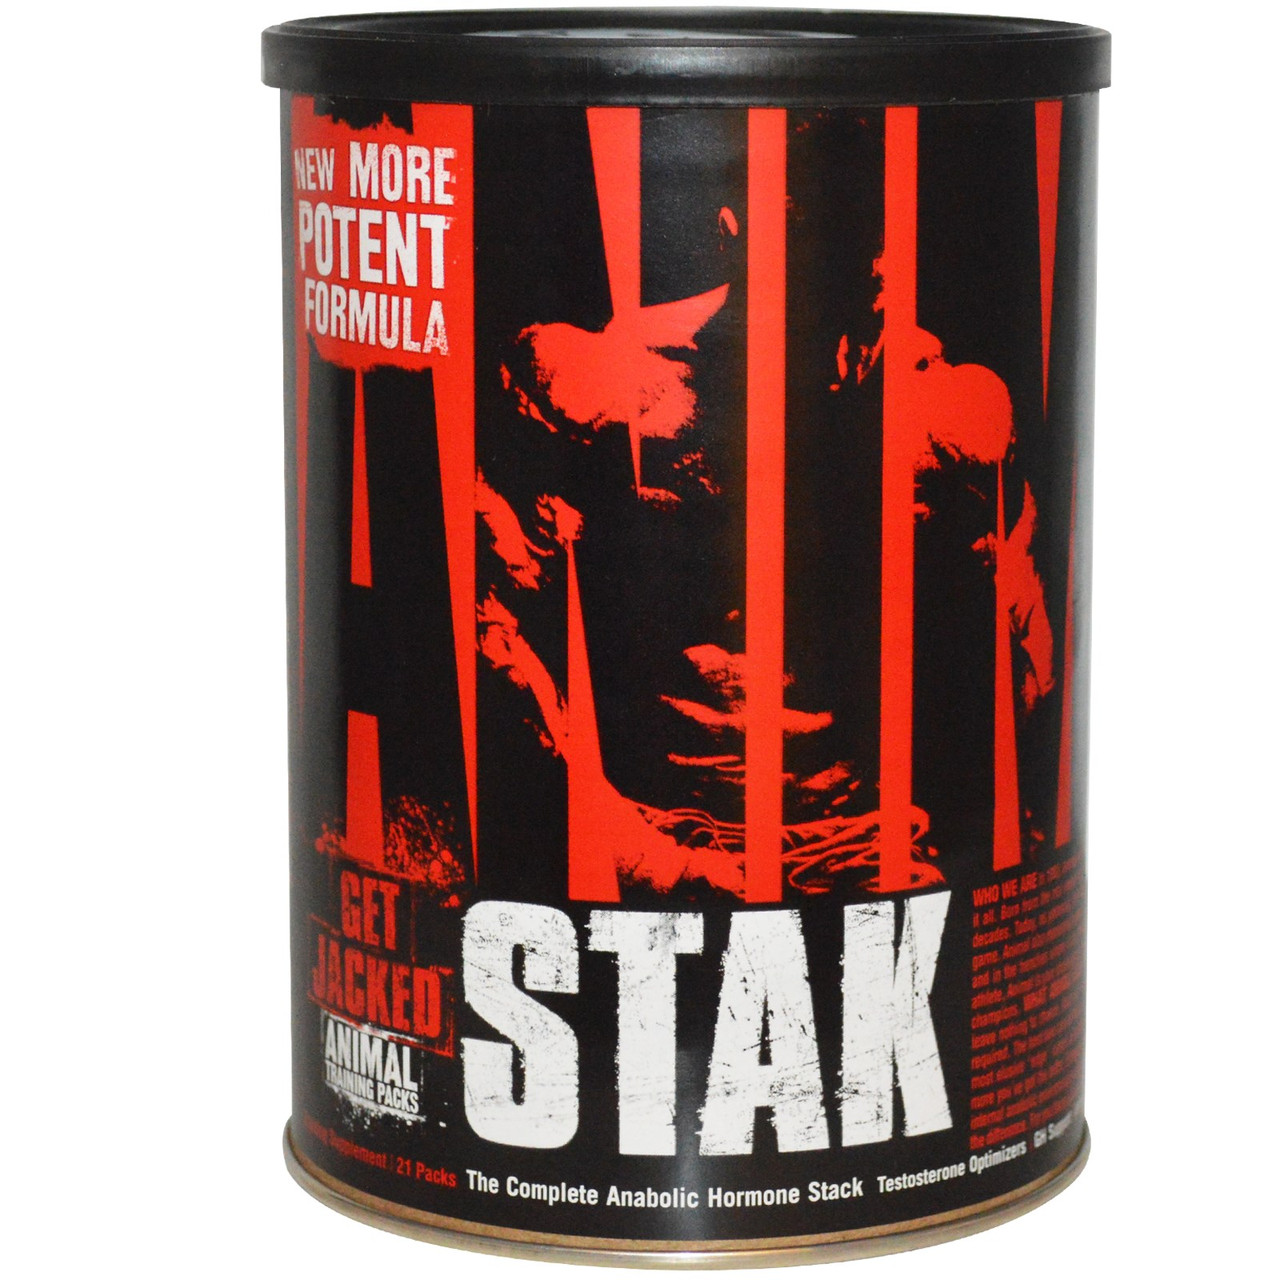 Animal M-Stak 21packs